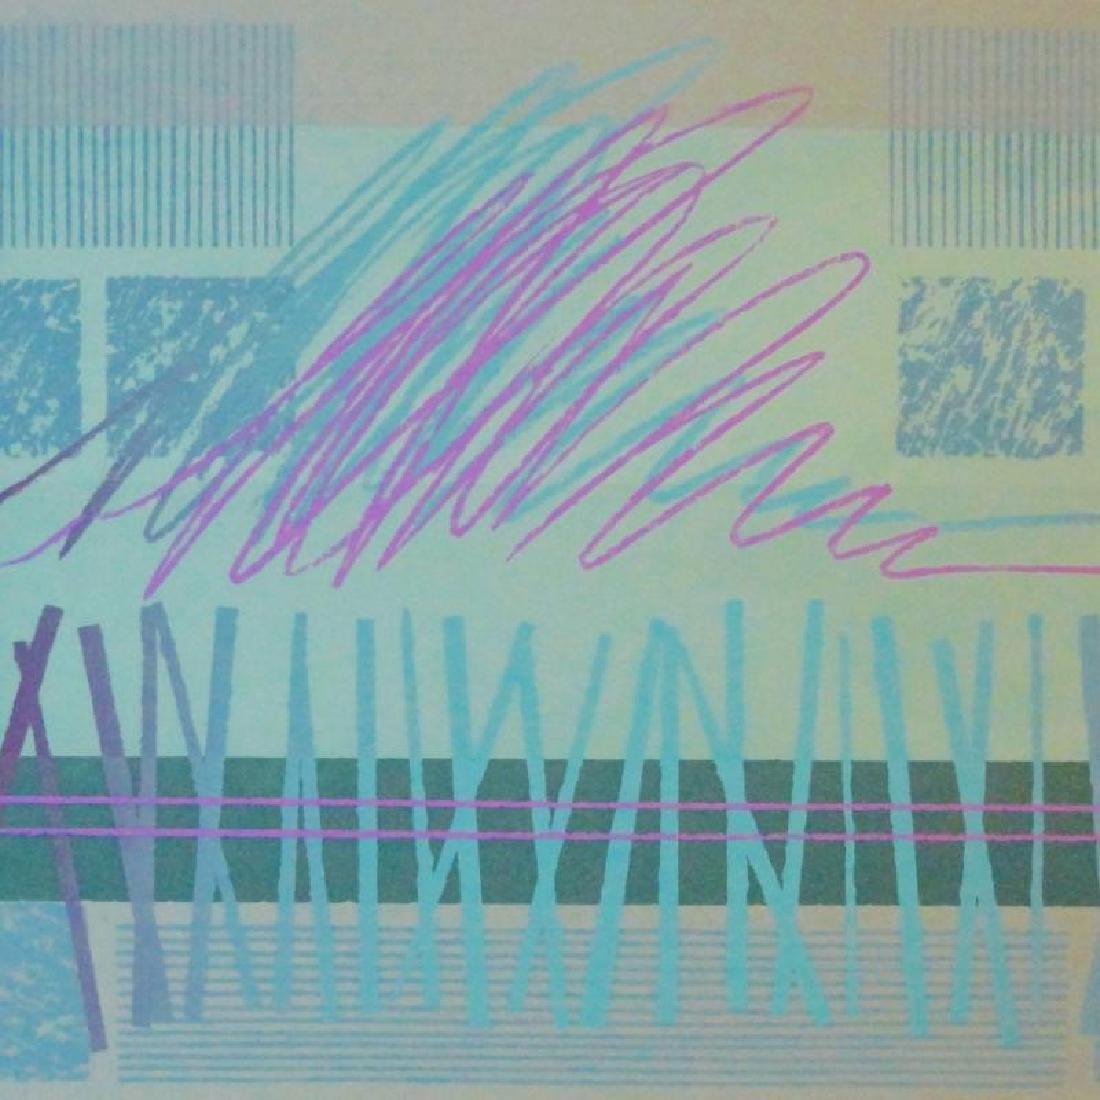 Abstract Modern Ltd Ed Signed Serigraph Huge Sale - 4